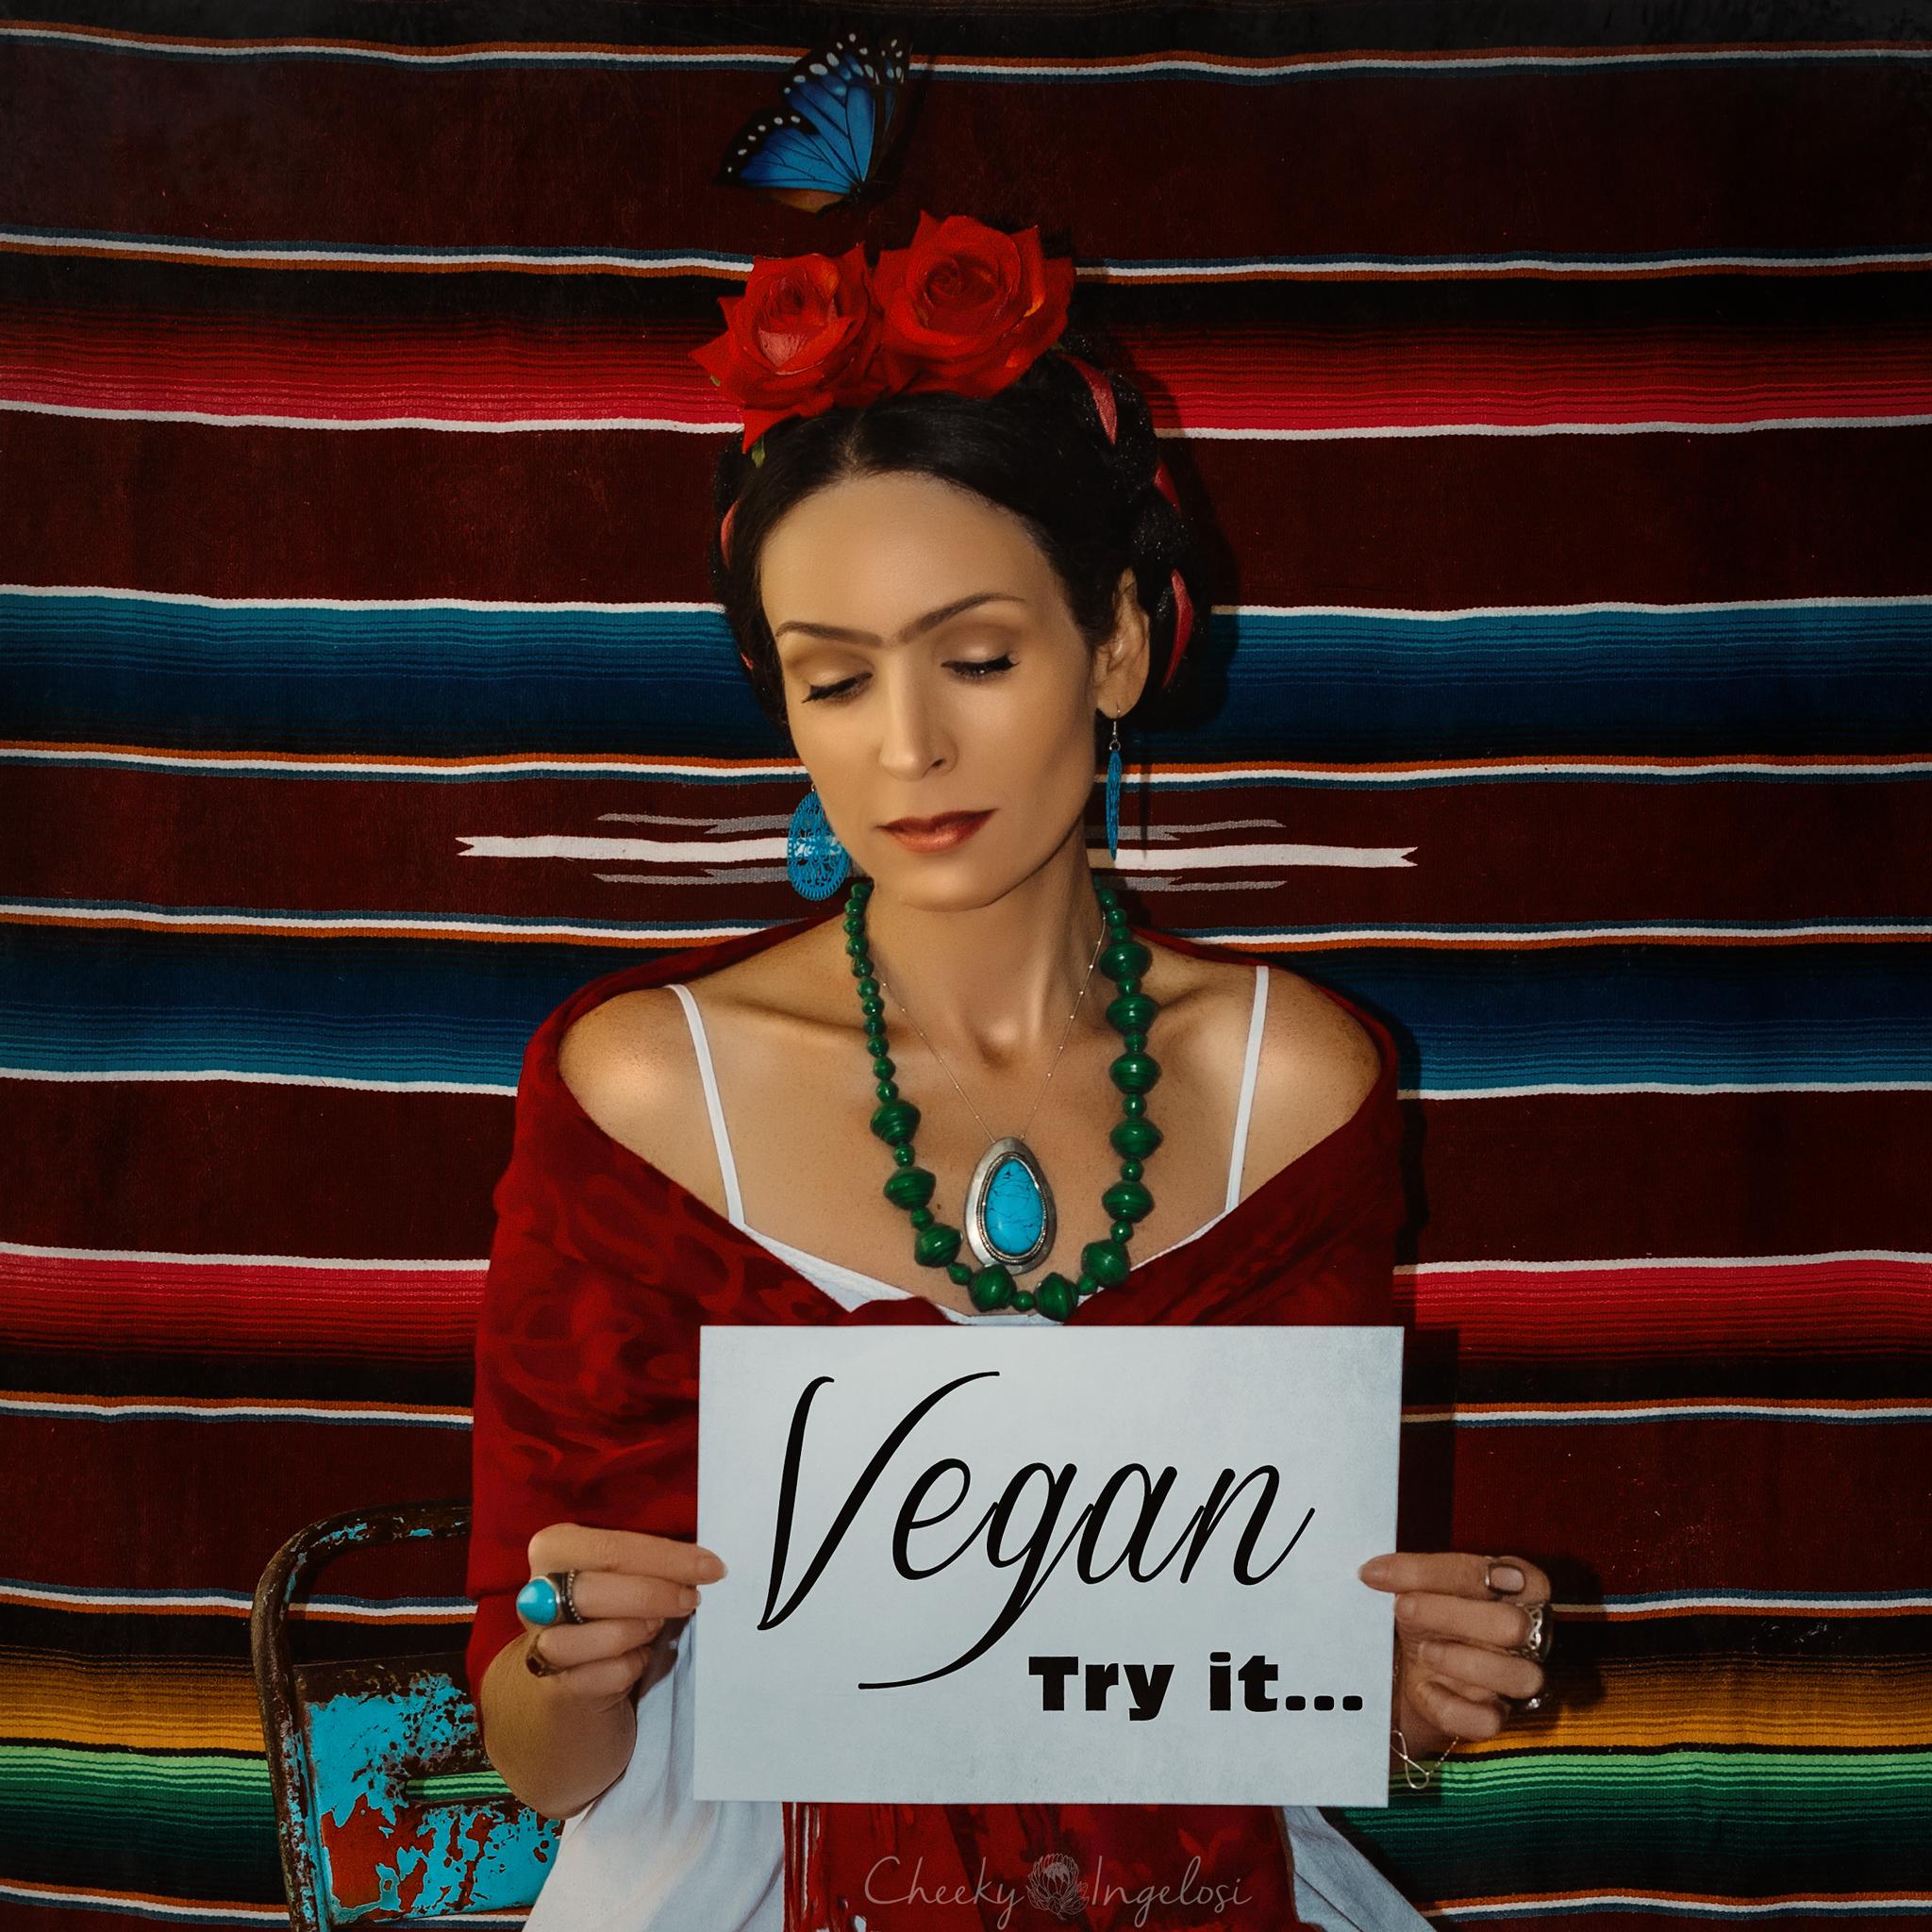 """Vegan Square"" by Cheeky Ingelosi"